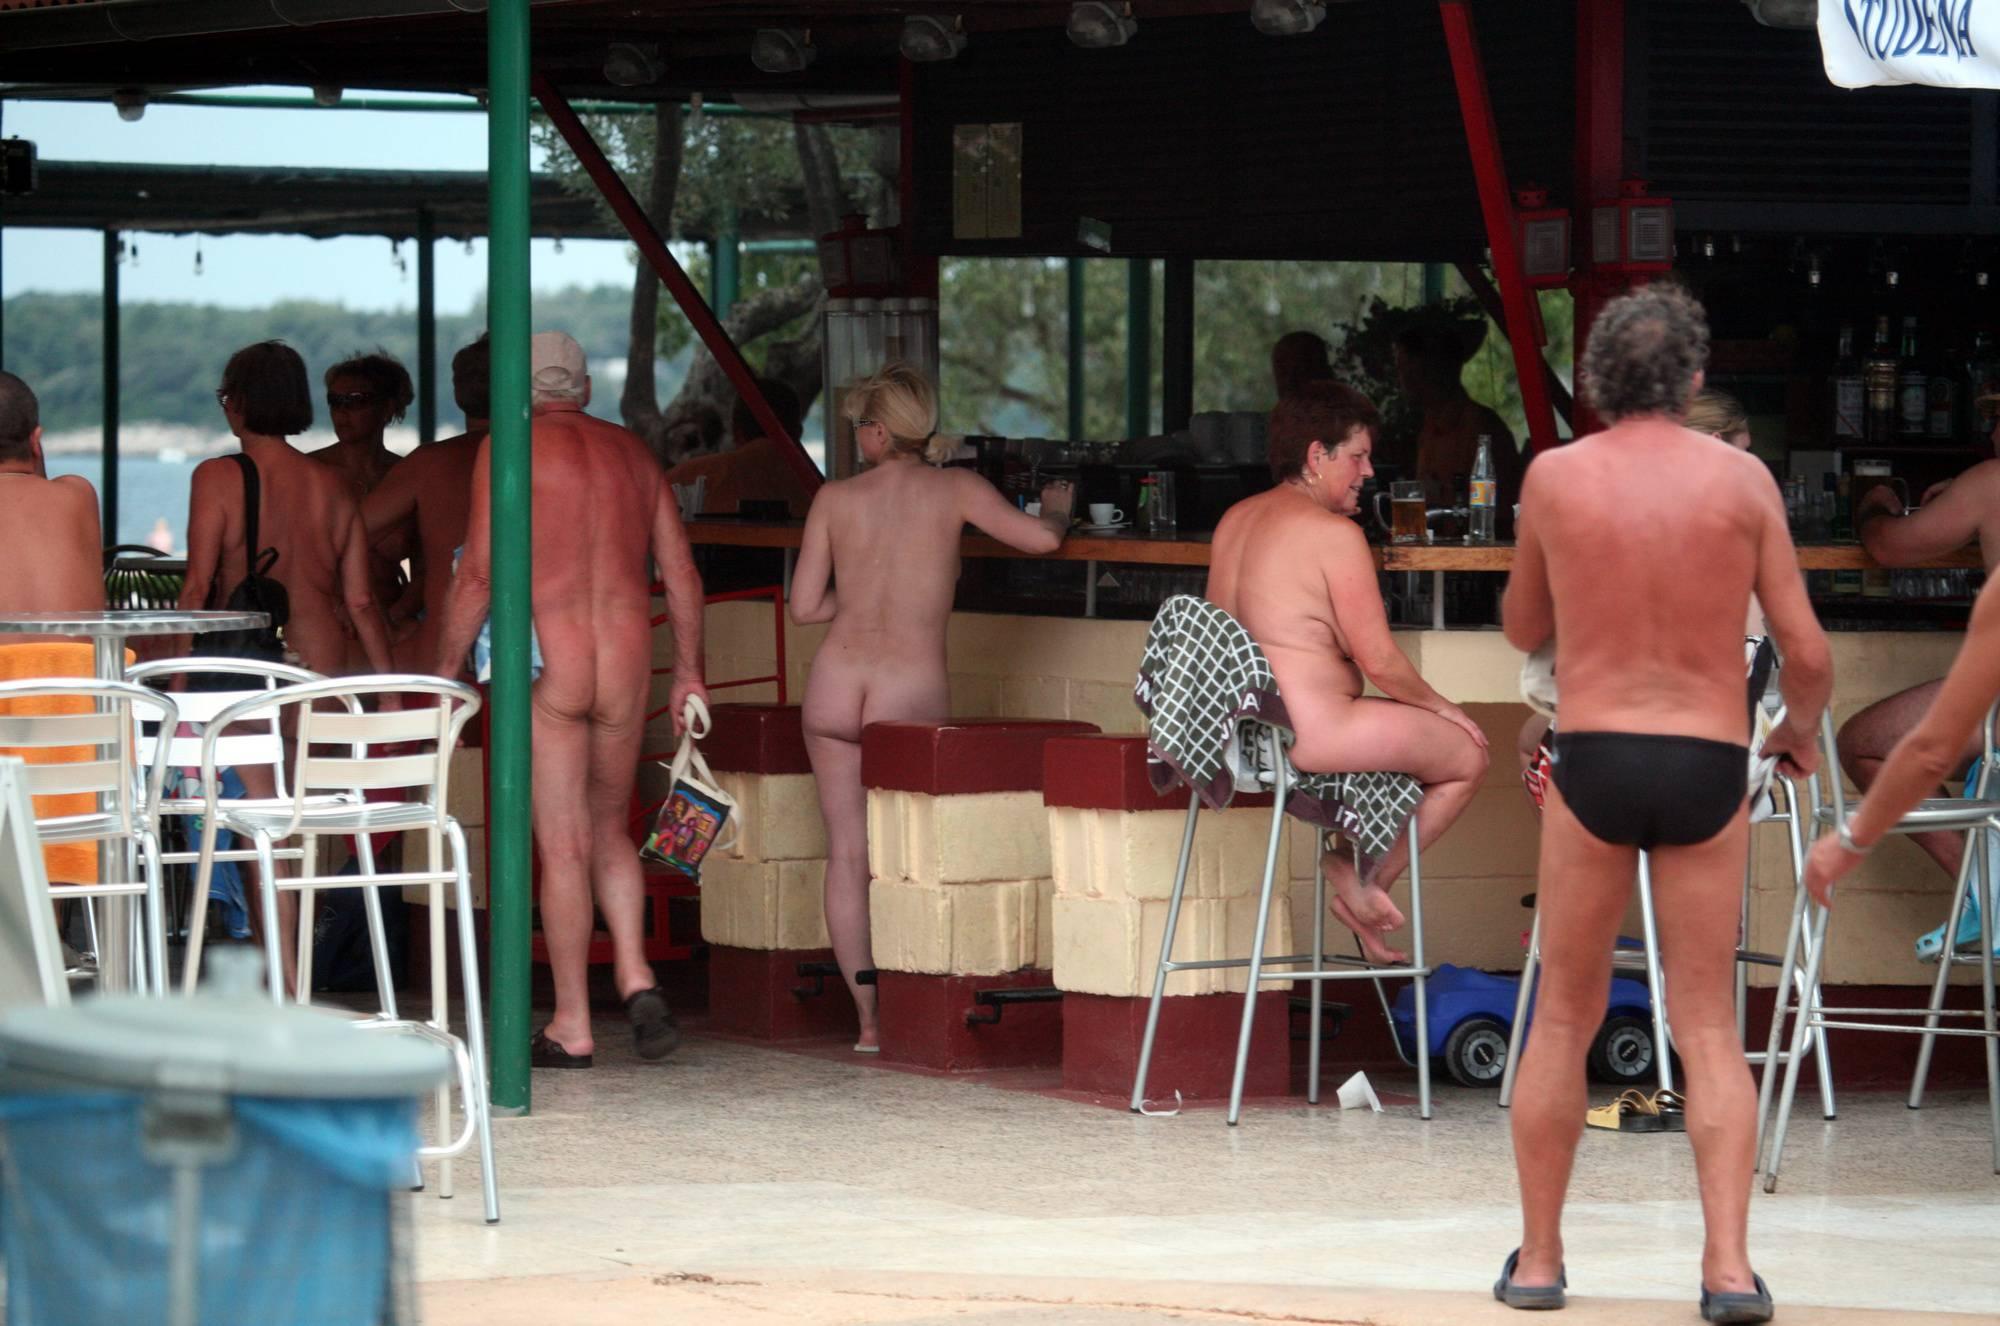 Pure Nudism Images Nudist Outdoor Diner View - 2